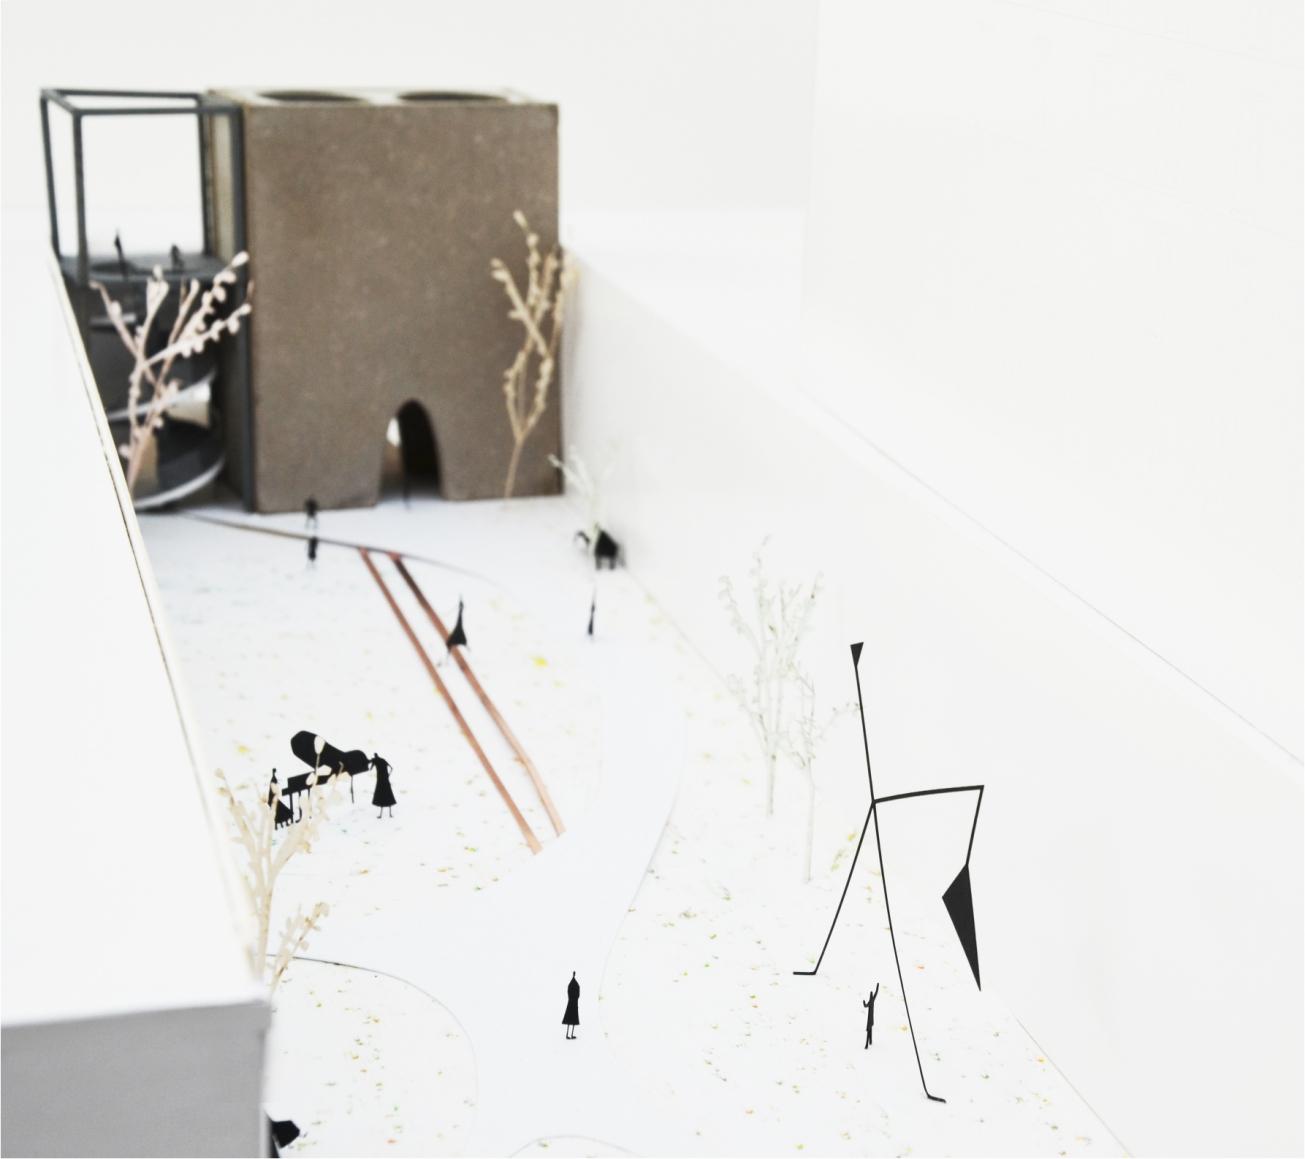 _027 - ARTS DU Son karina+borodaï . M2 . EPFL . MUSEUM PARK . HARRY GUGGER LABA